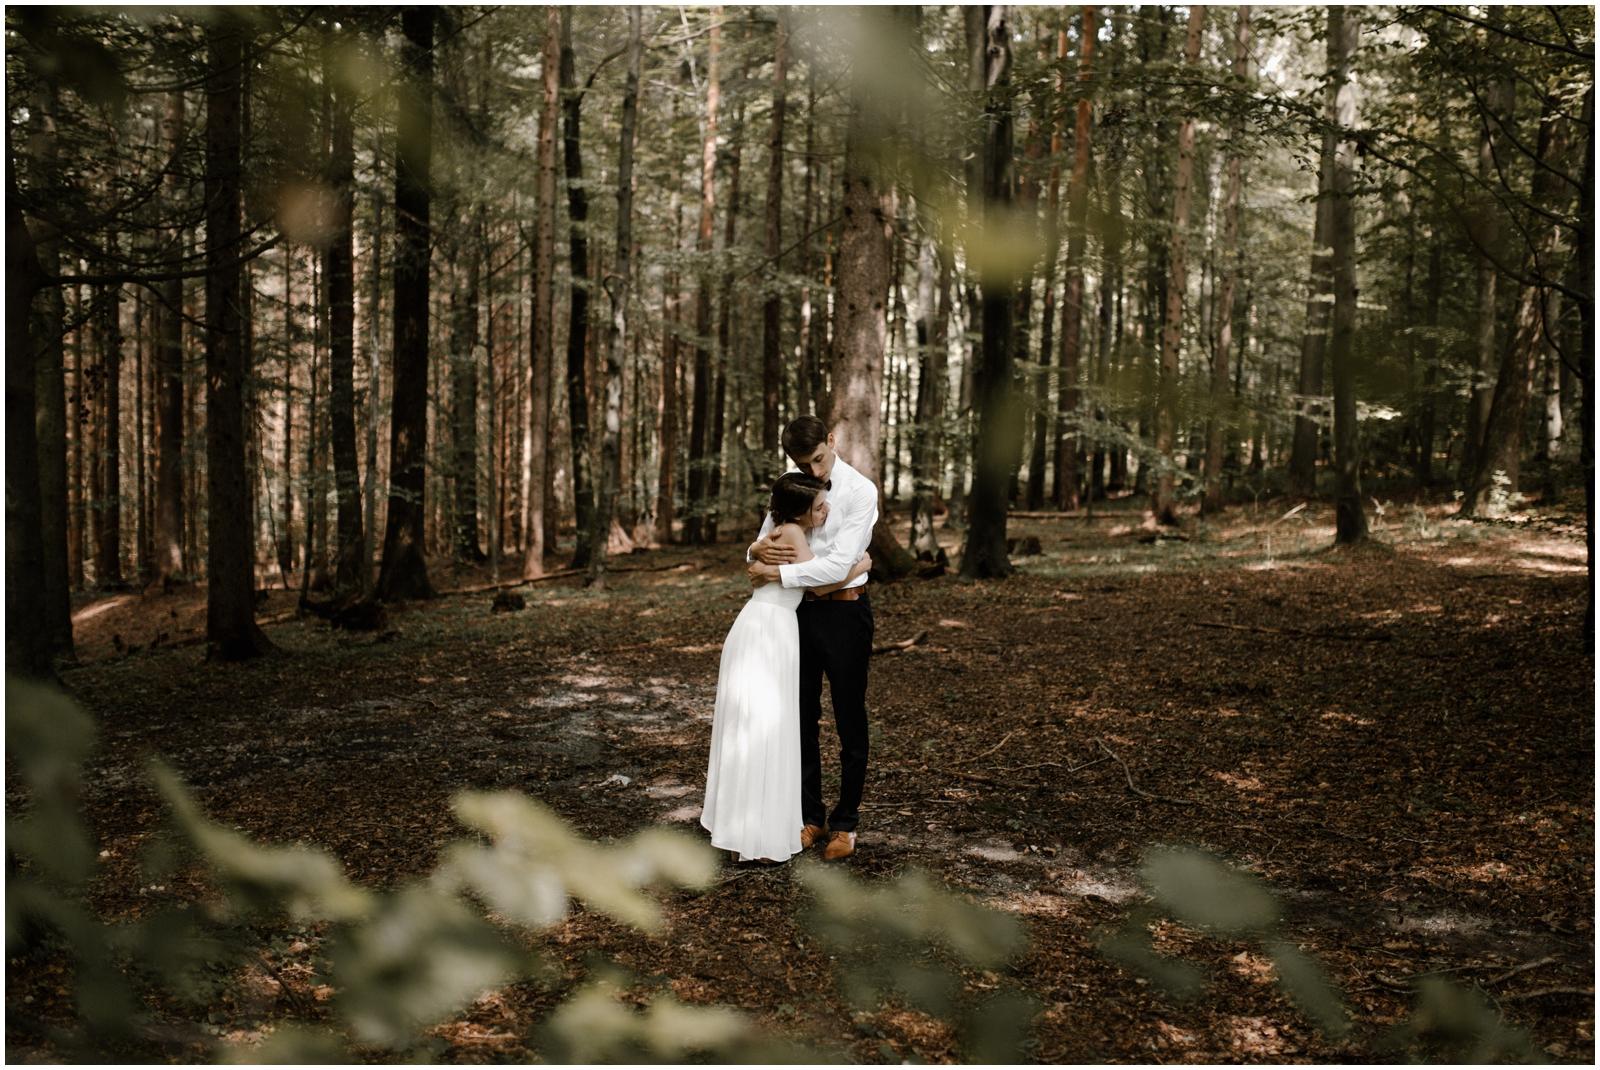 mirjam_thomas_wedding-270.jpg